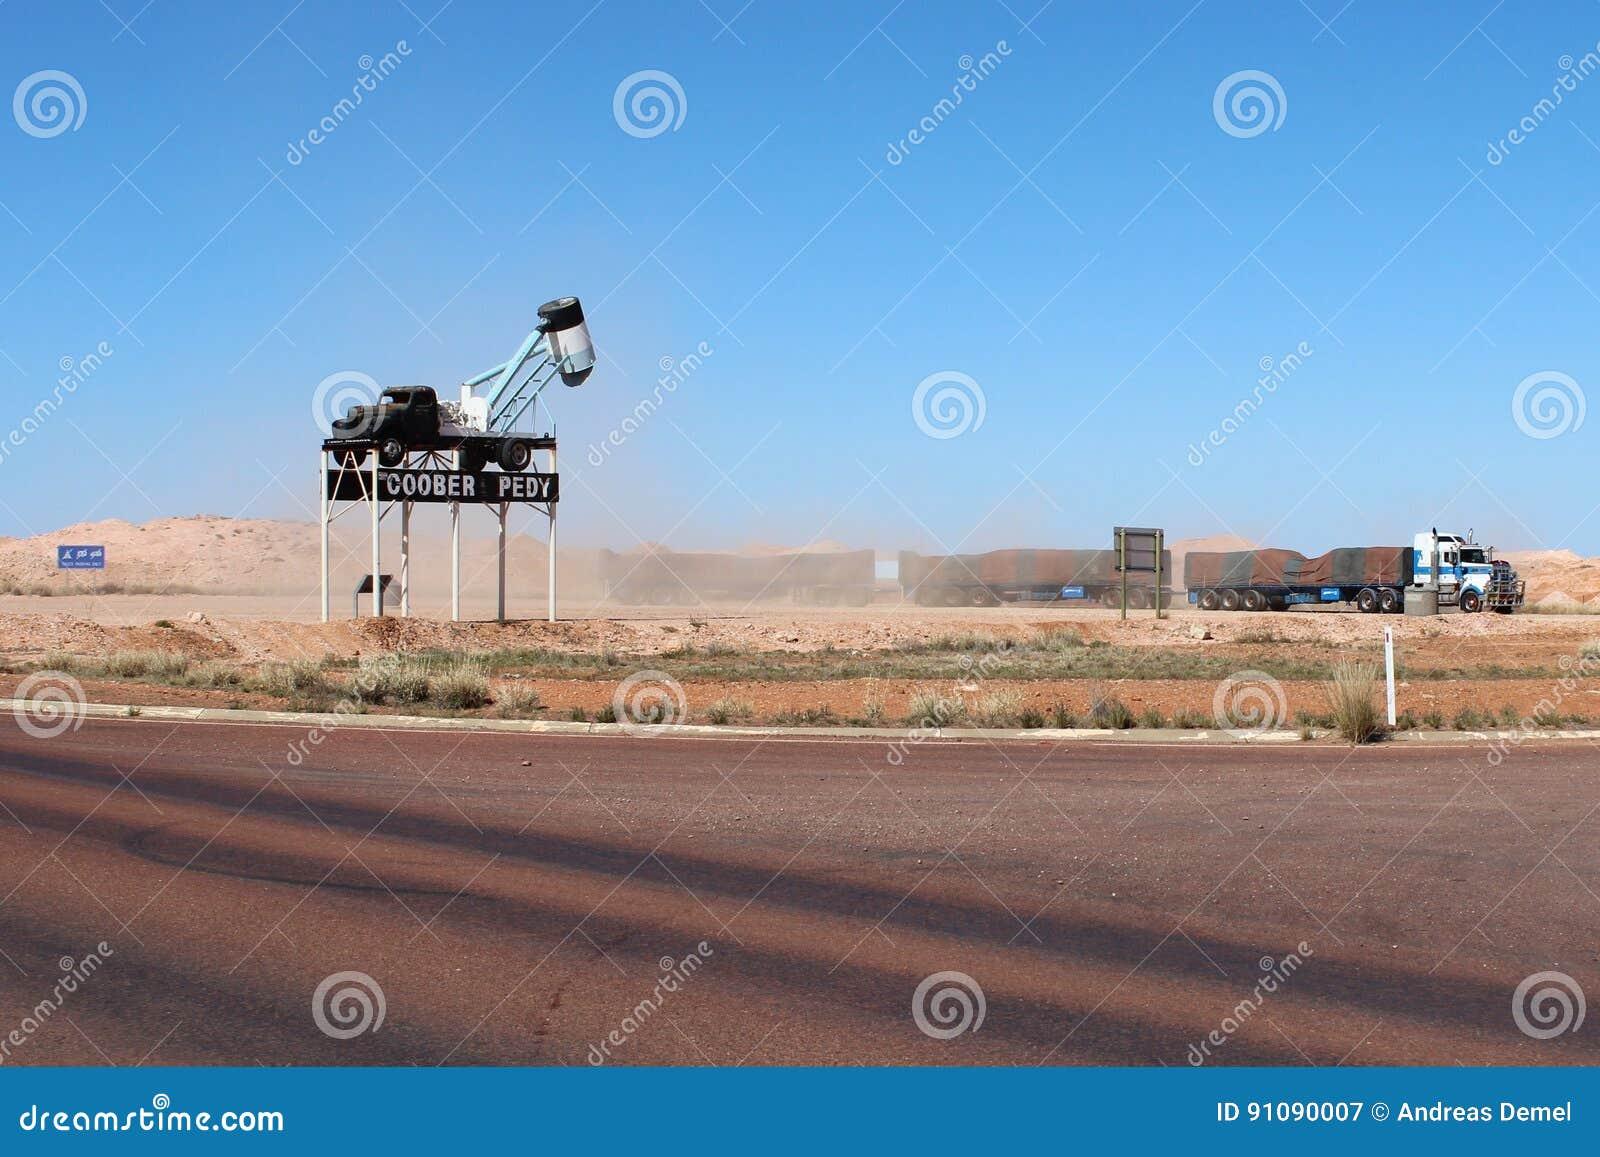 A road train in a rest area in Coober Pedy, South Australia